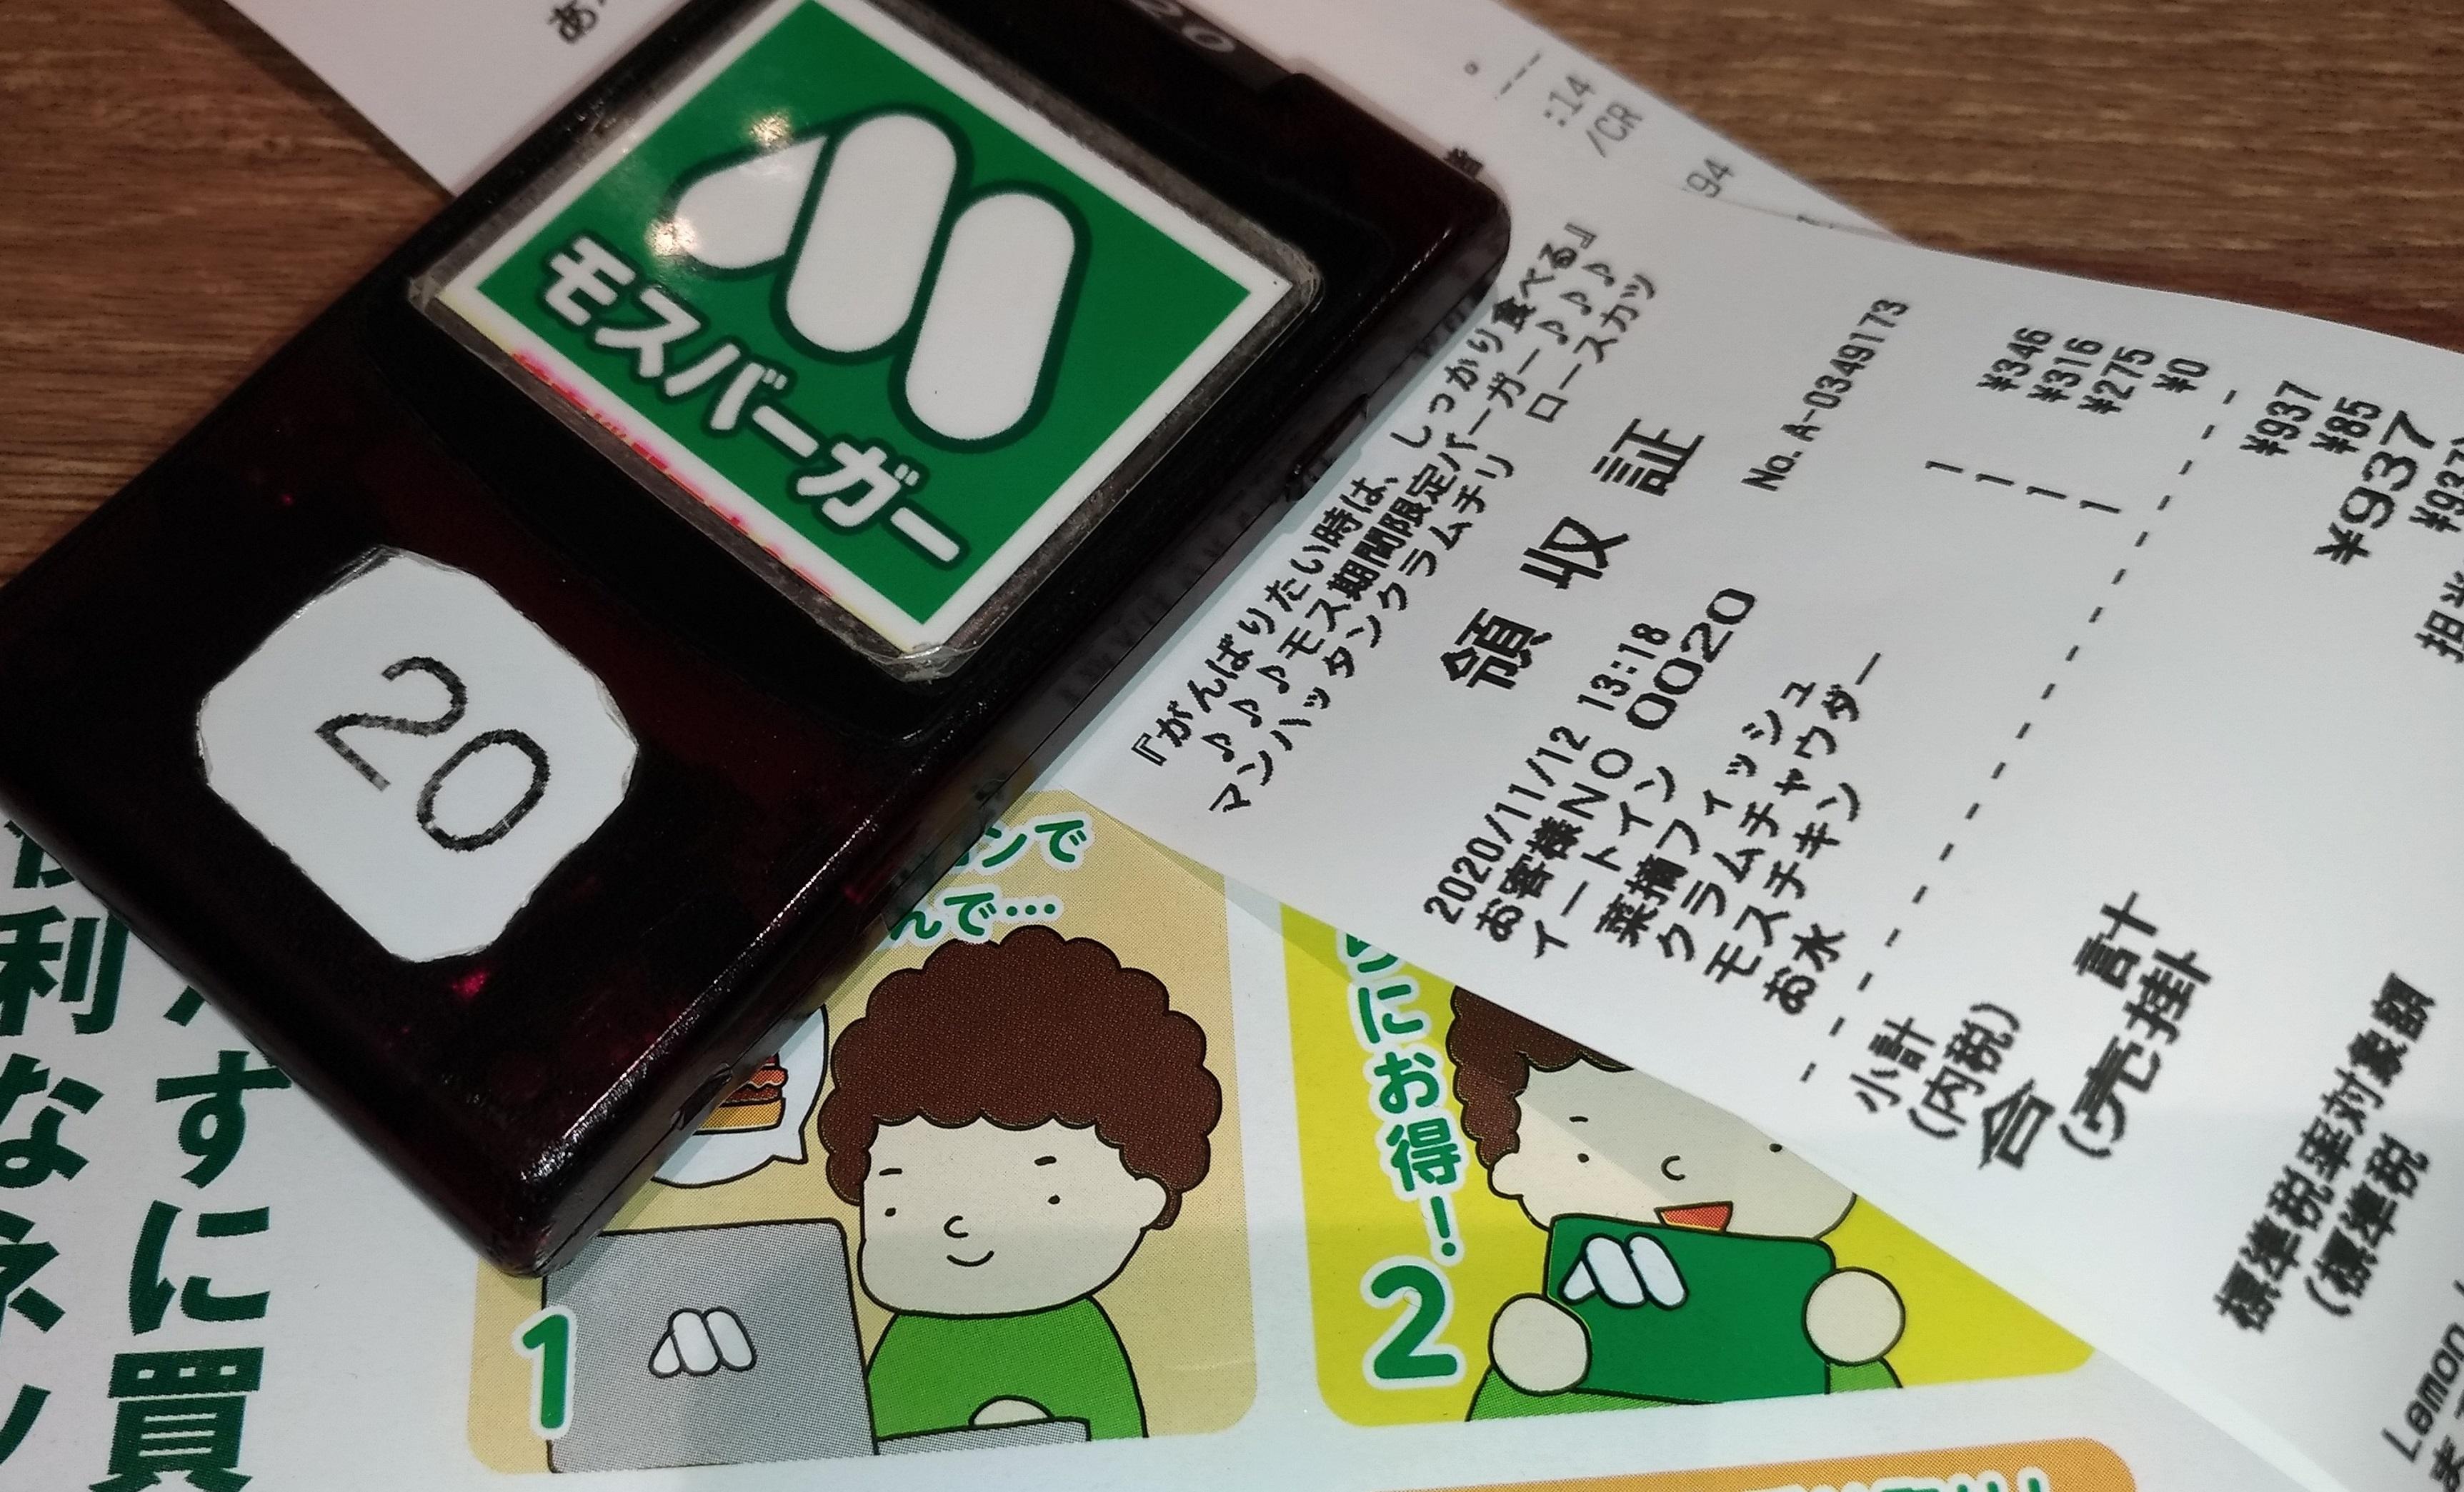 mos_yasai_natsumi_1.jpg